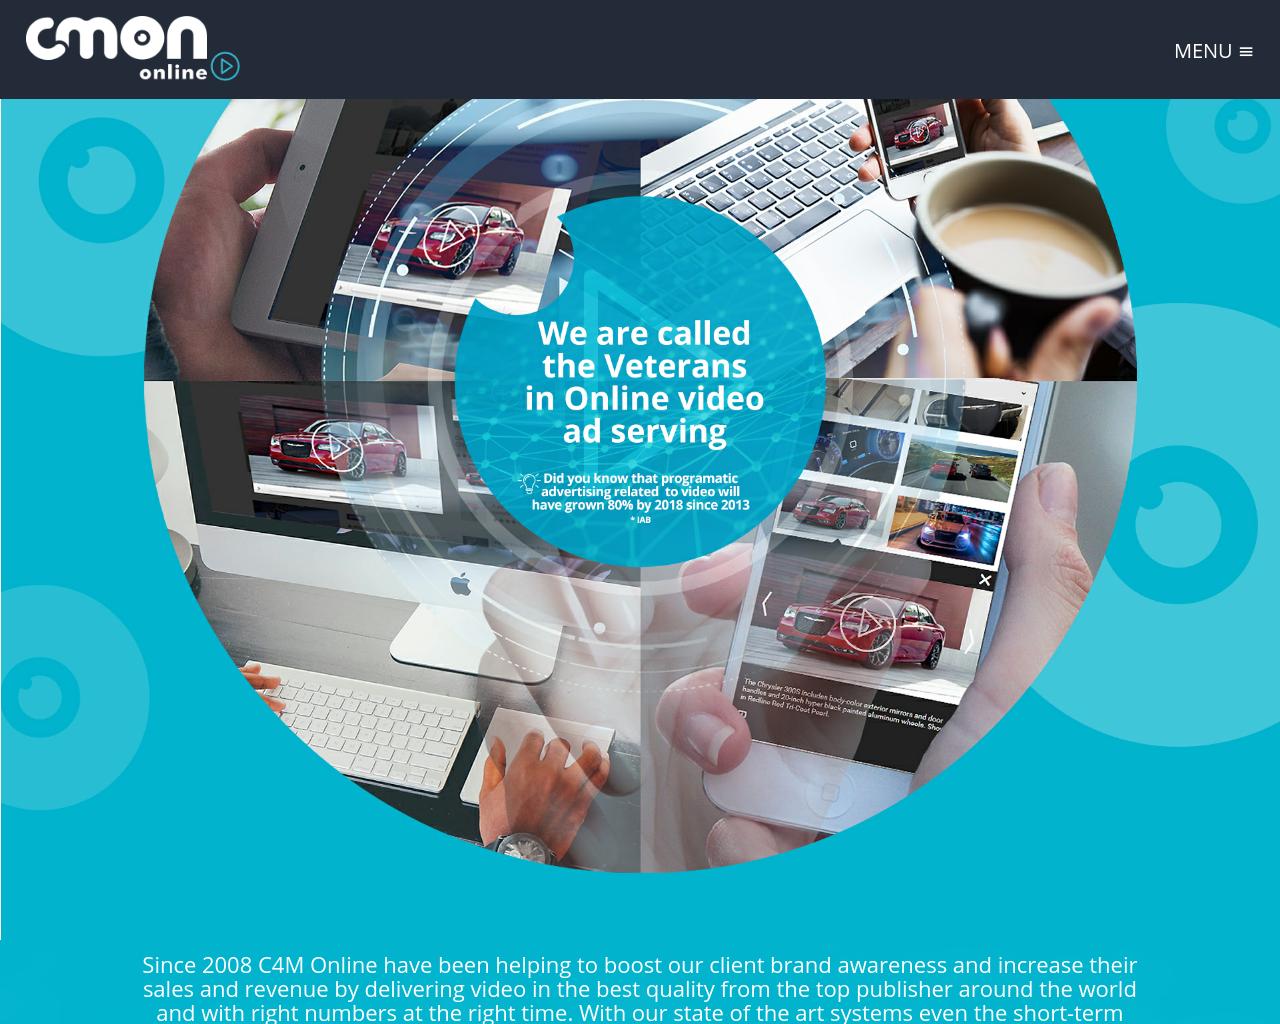 Creafi-Online-Media-Advertising-Reviews-Pricing